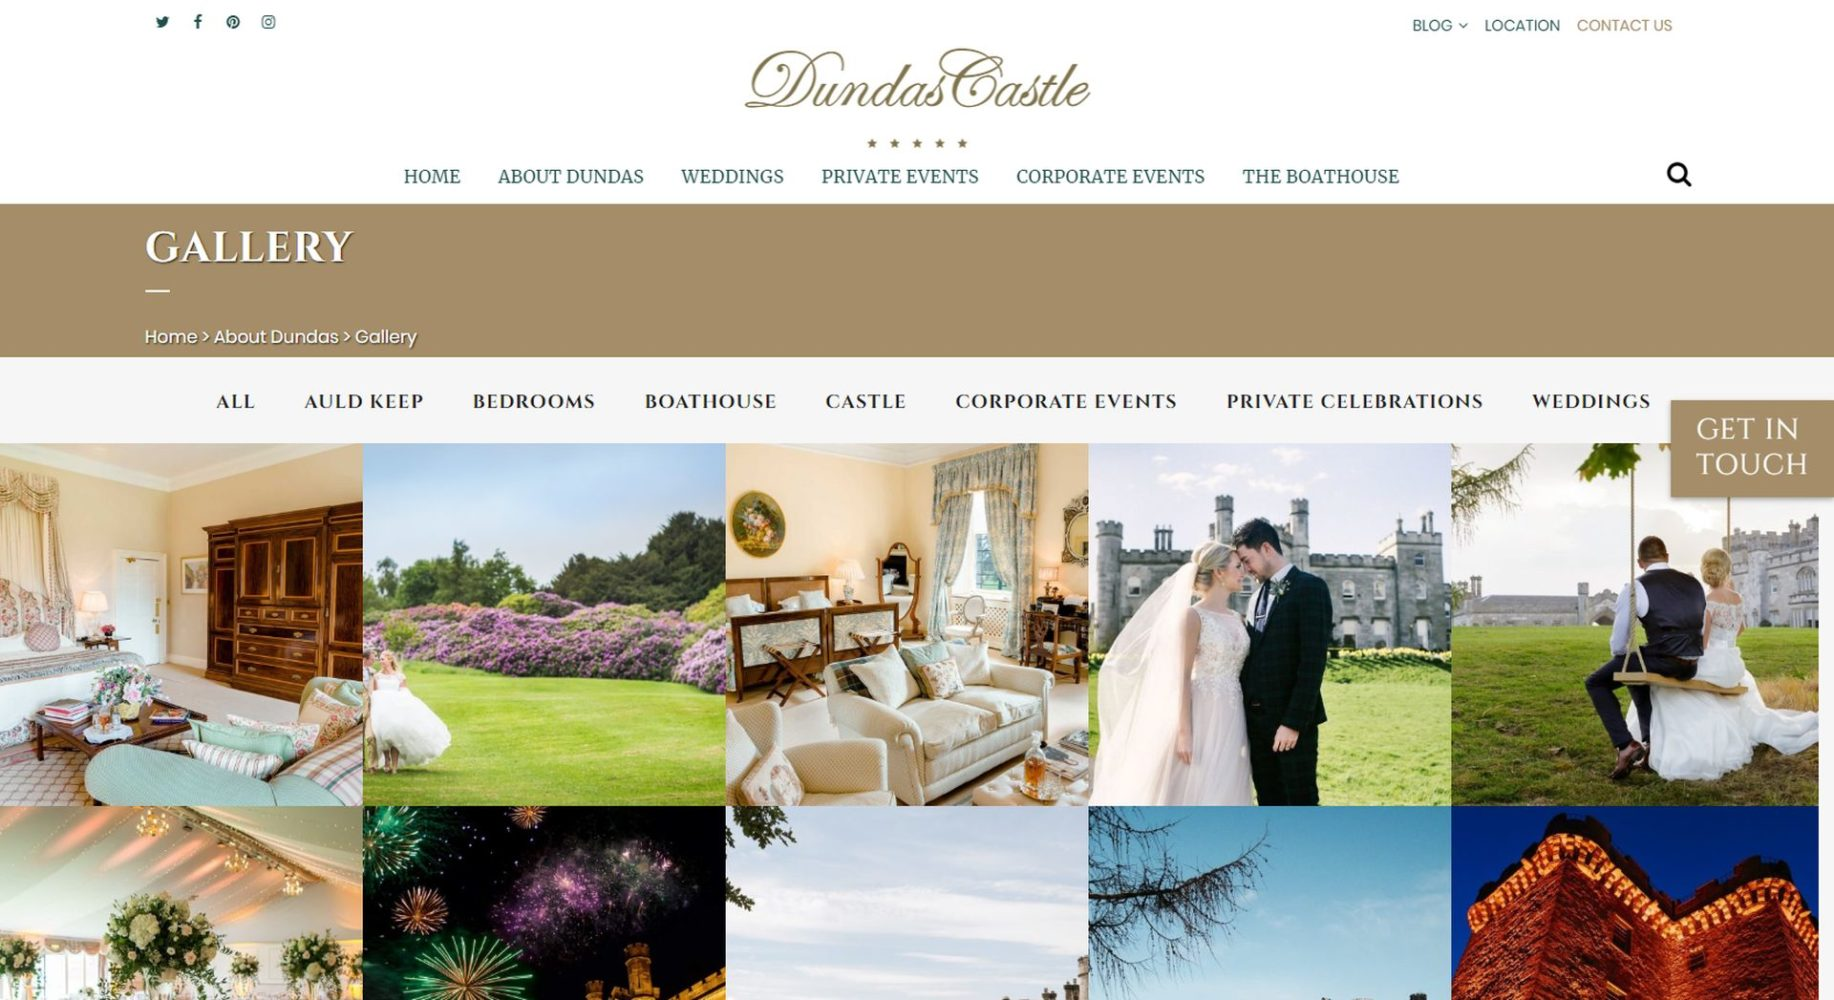 Dundas Castle Website Design Gallery